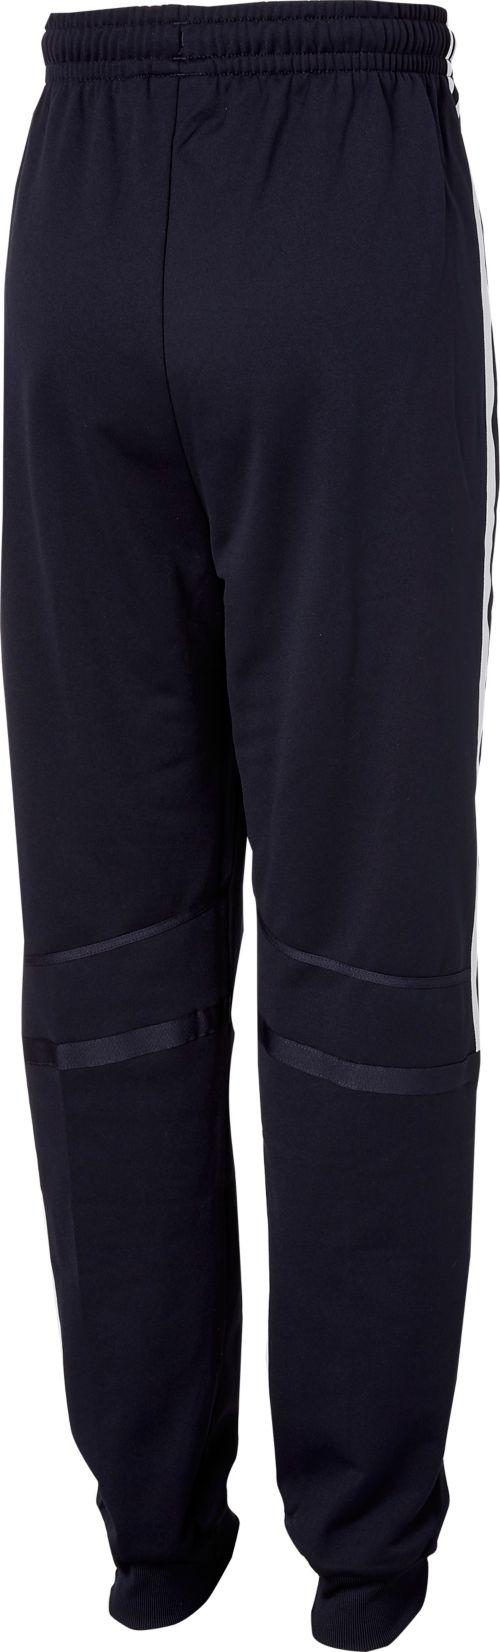 b316bf27eb50 adidas Originals Boys  CLR84 Track Pants